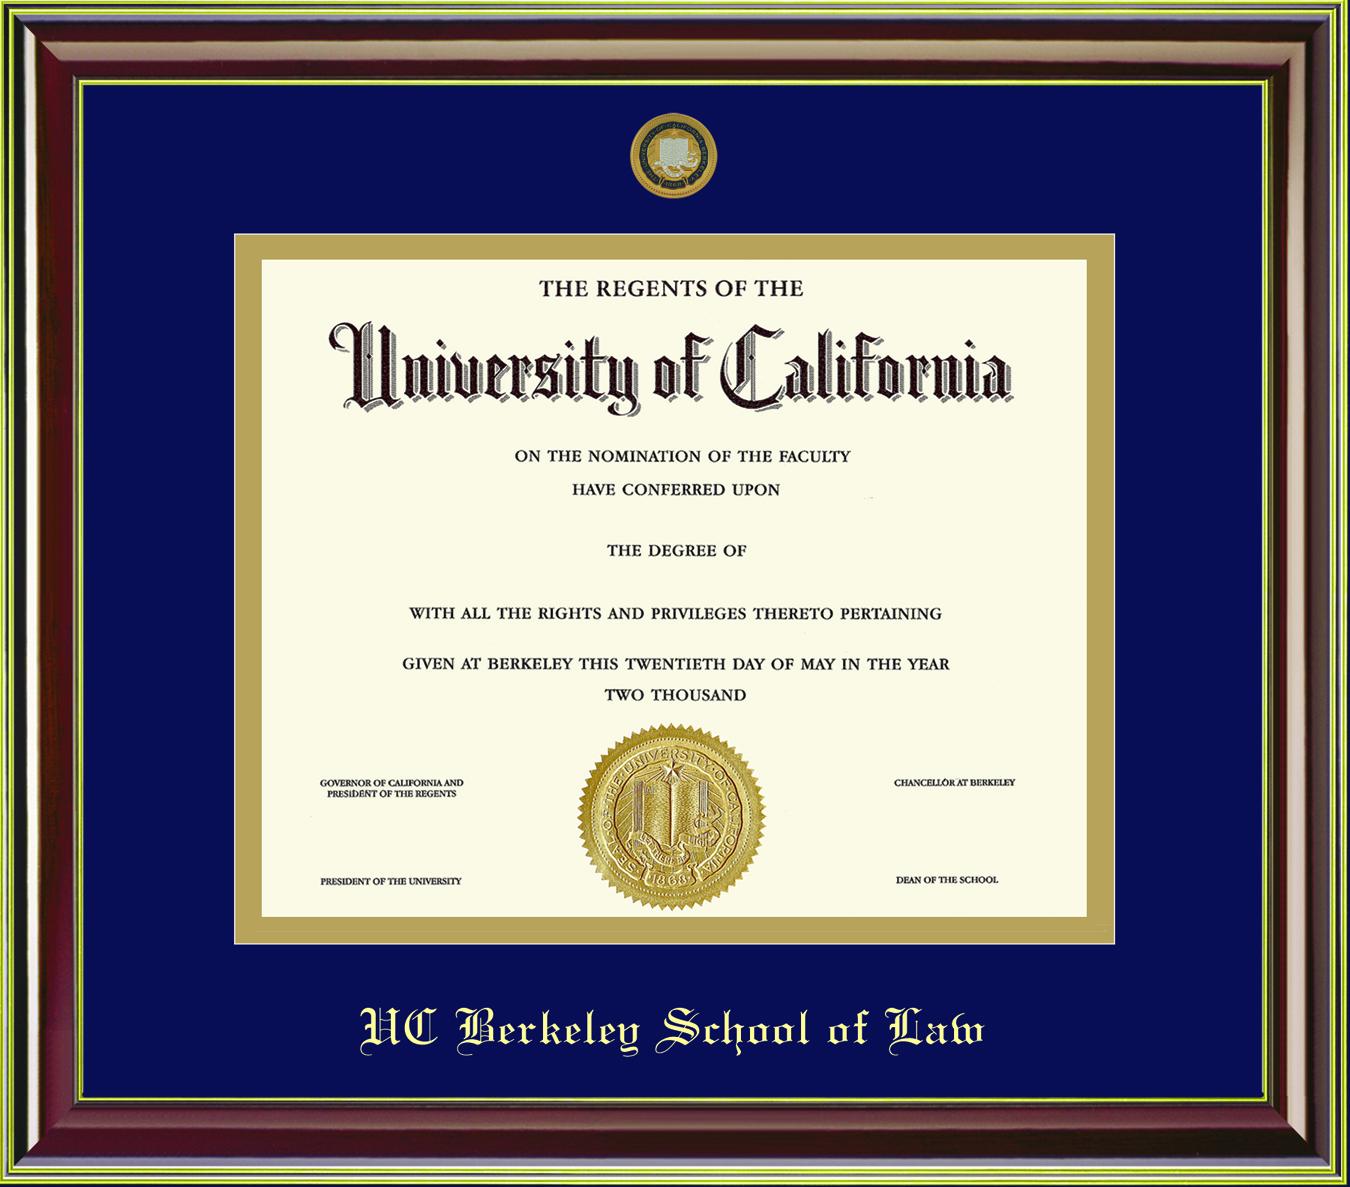 Diploma Frame Mahogany Gold 11x14 School of Law